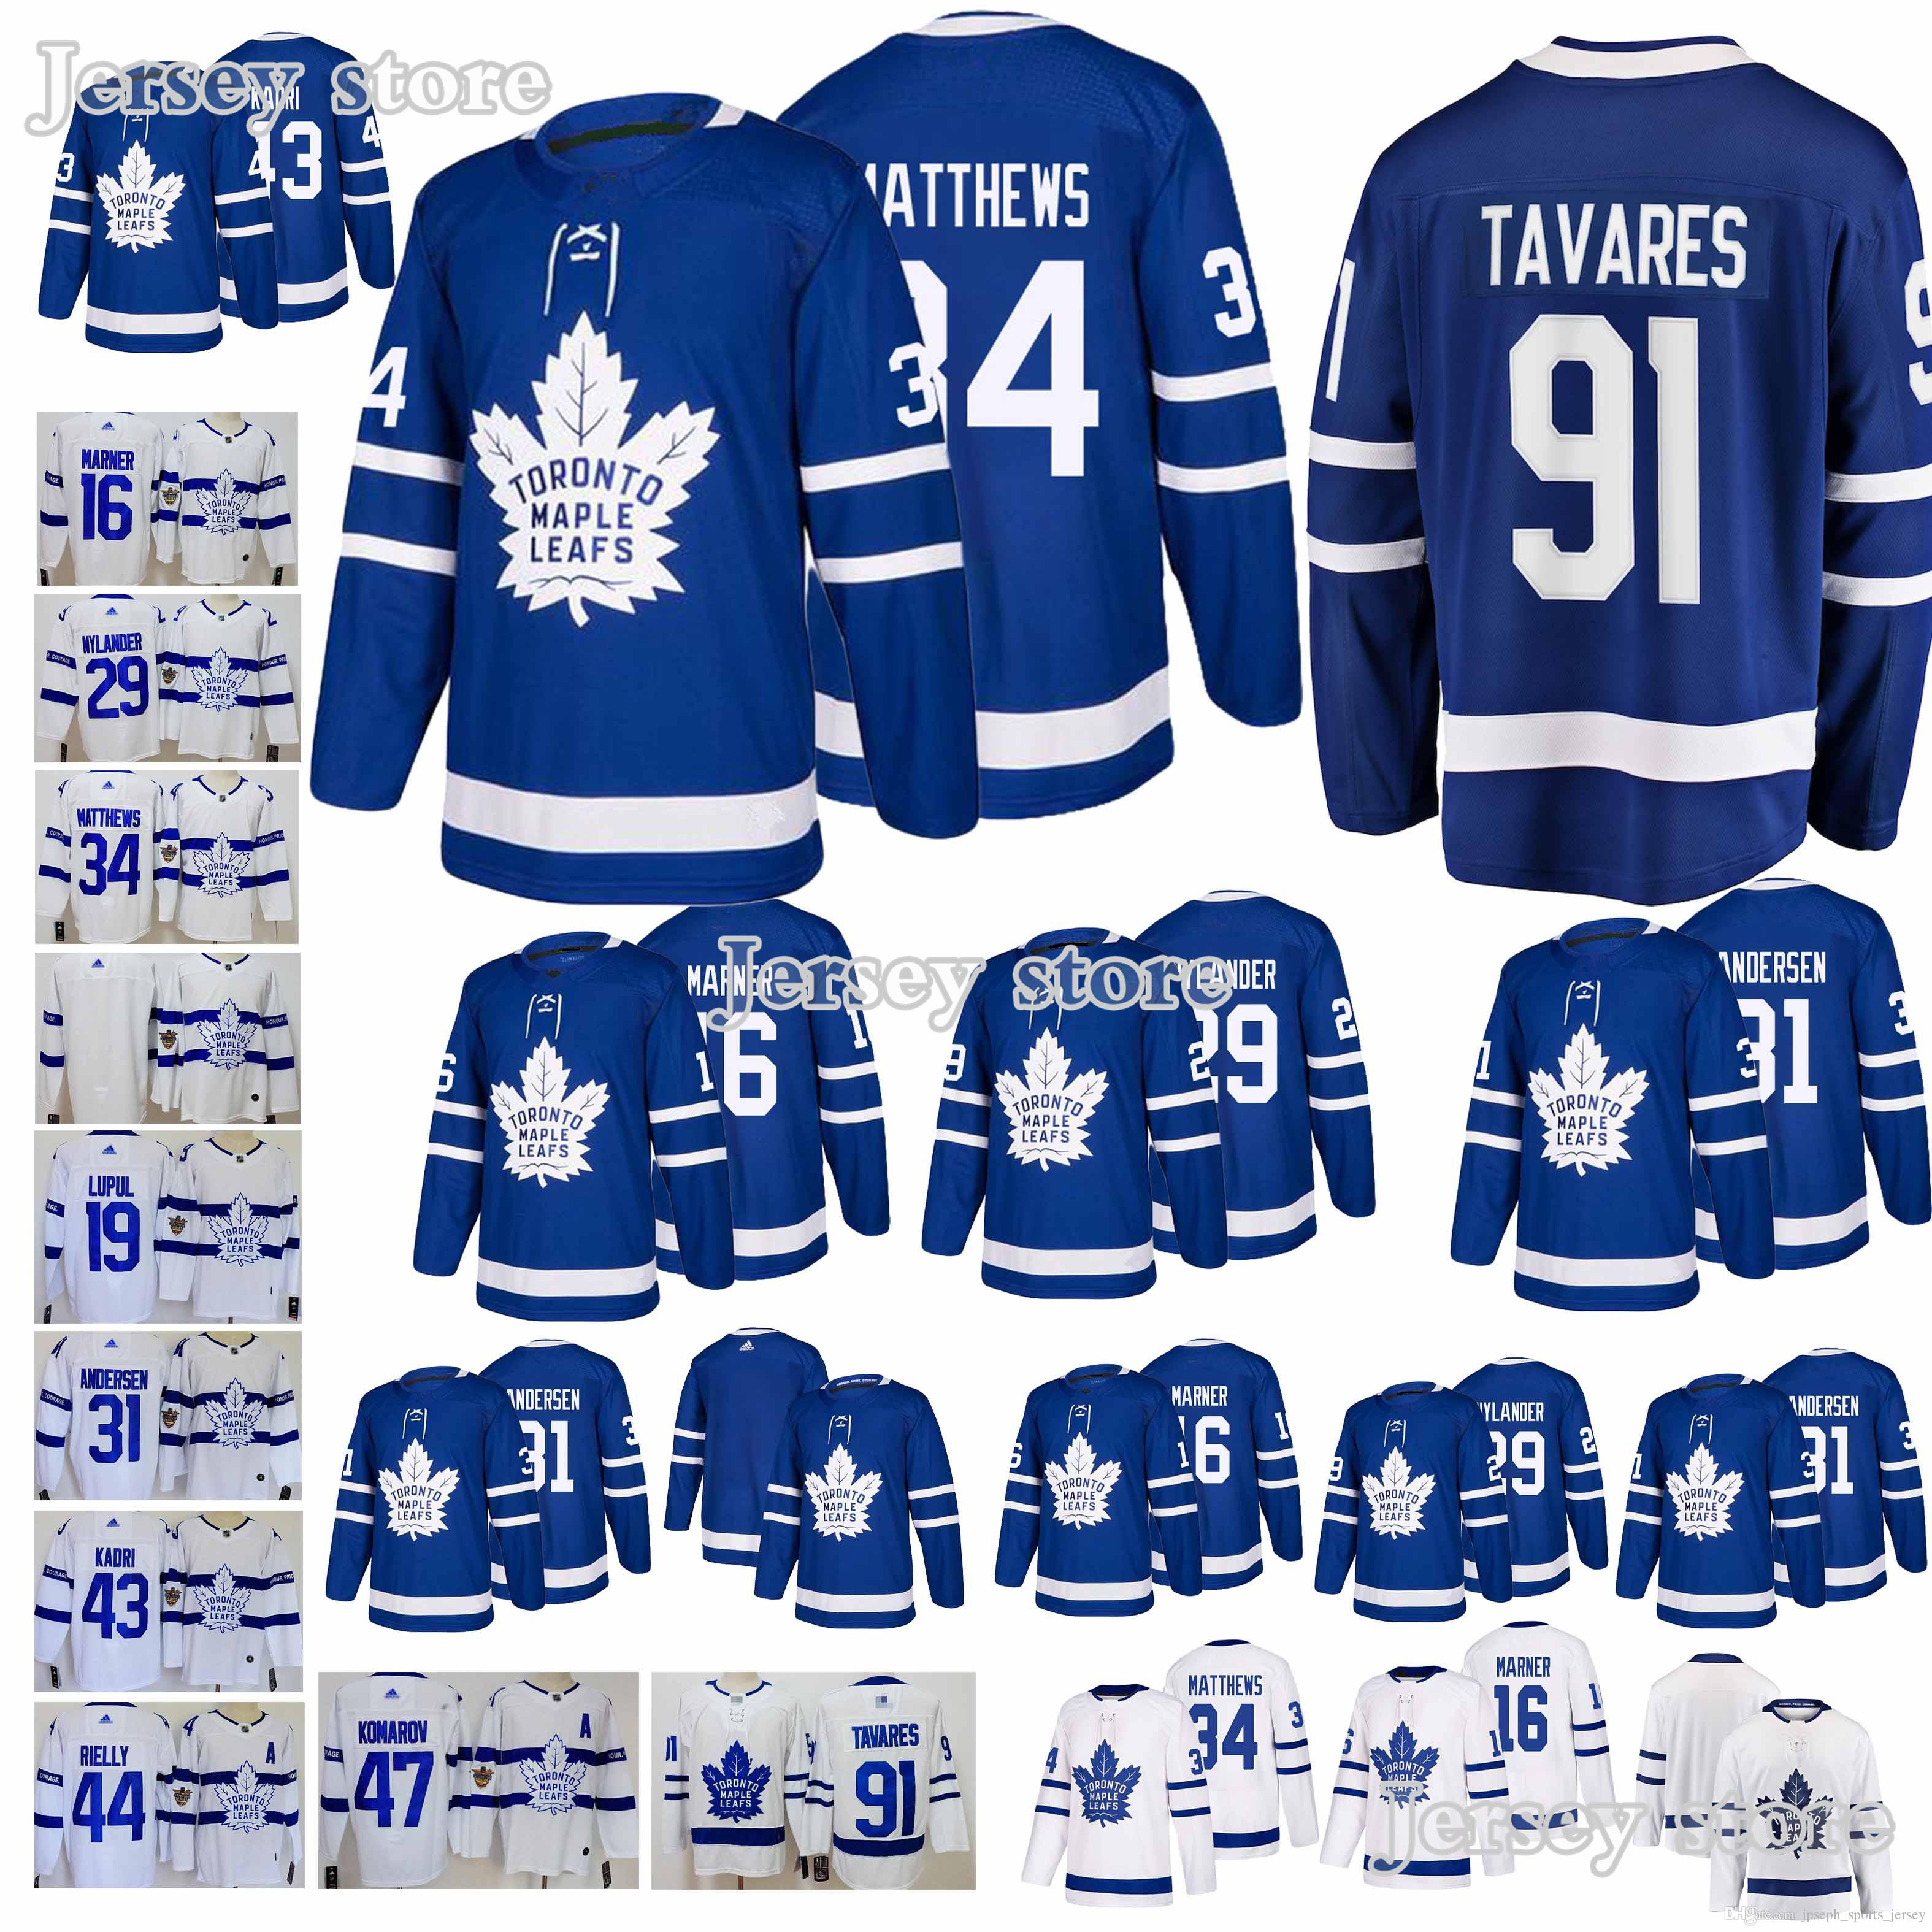 meet 721e1 9a2eb Toronto Maple Leafs jerseys 34 Auston Matthews 16 Mitch Marner 43 Nazem  Kadri High-quality new men jersey